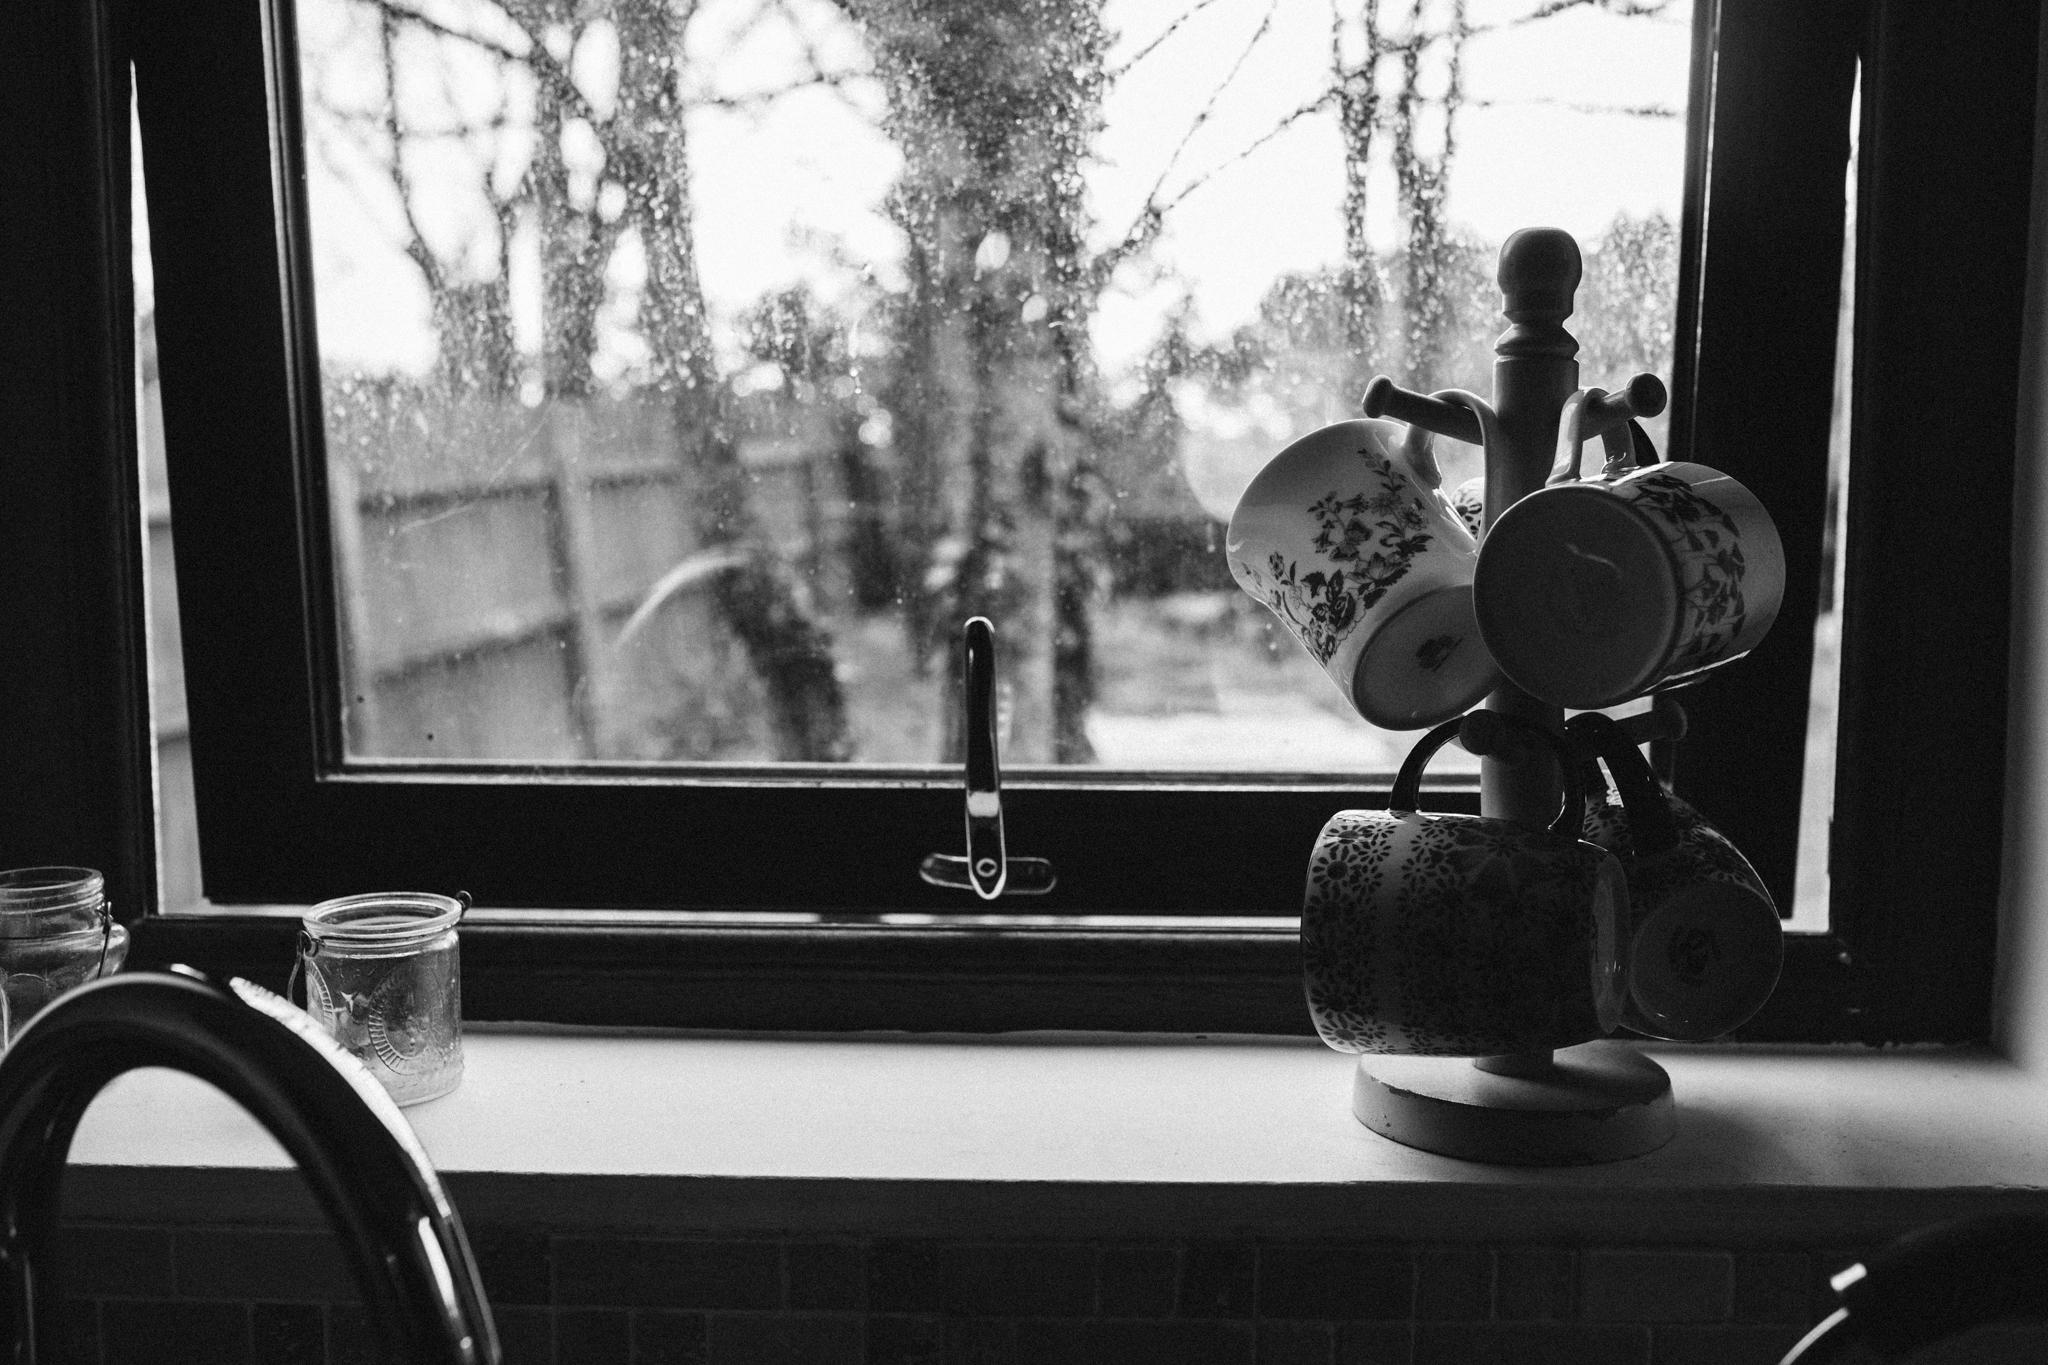 ireland_galway_dublin_rebecca_burt_photography-9.jpg